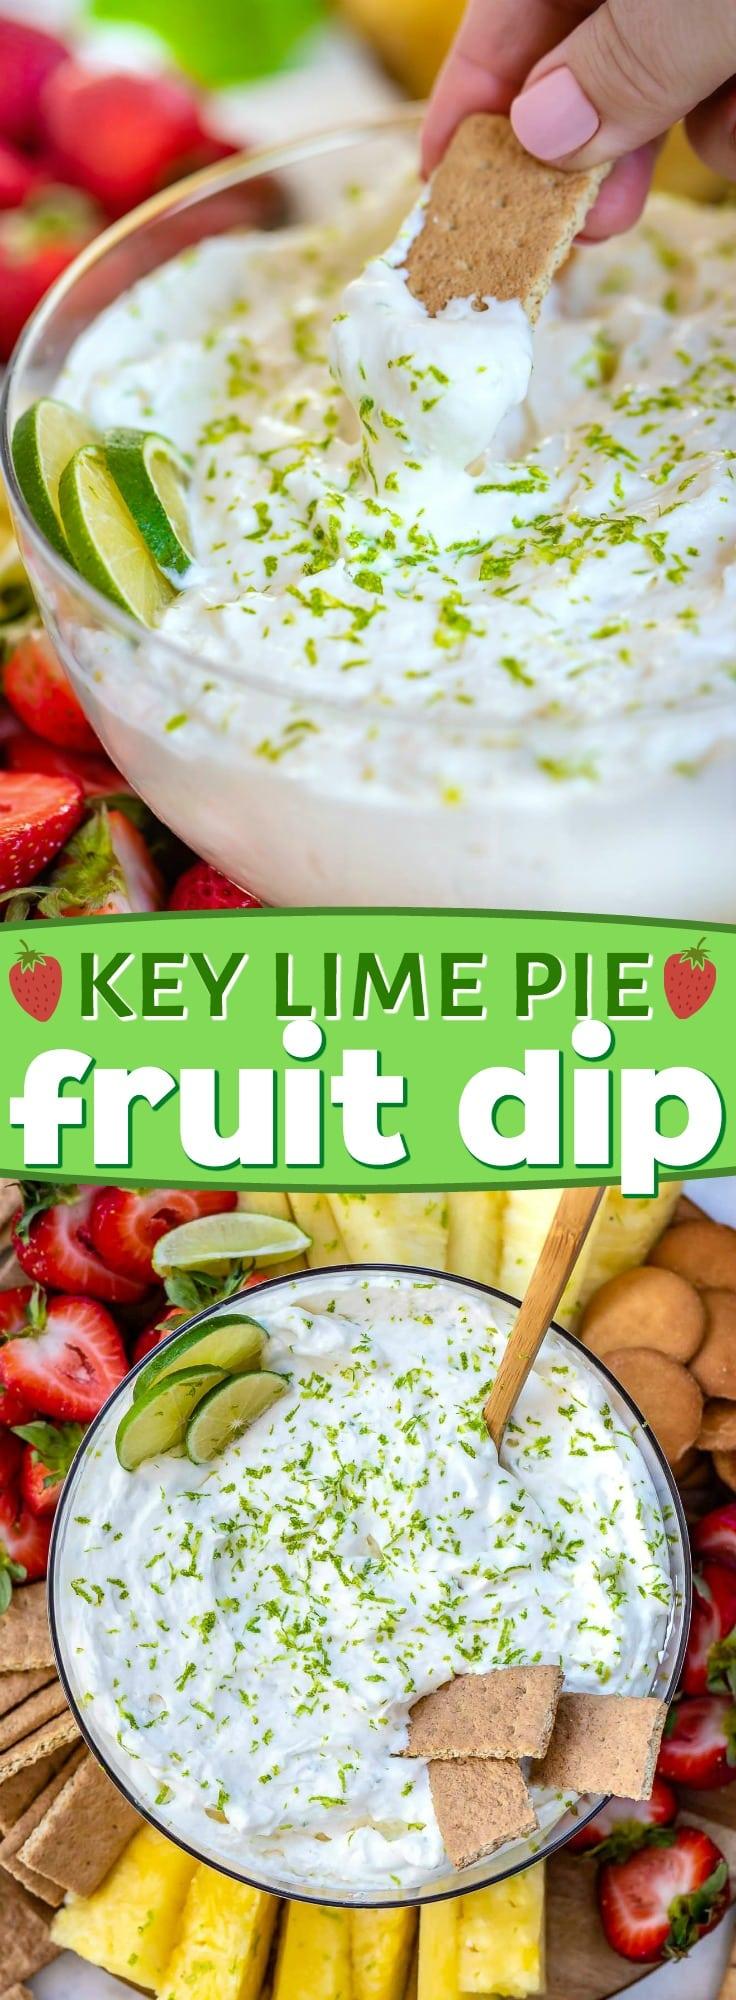 fruit-dip-key-lime-pie-collage